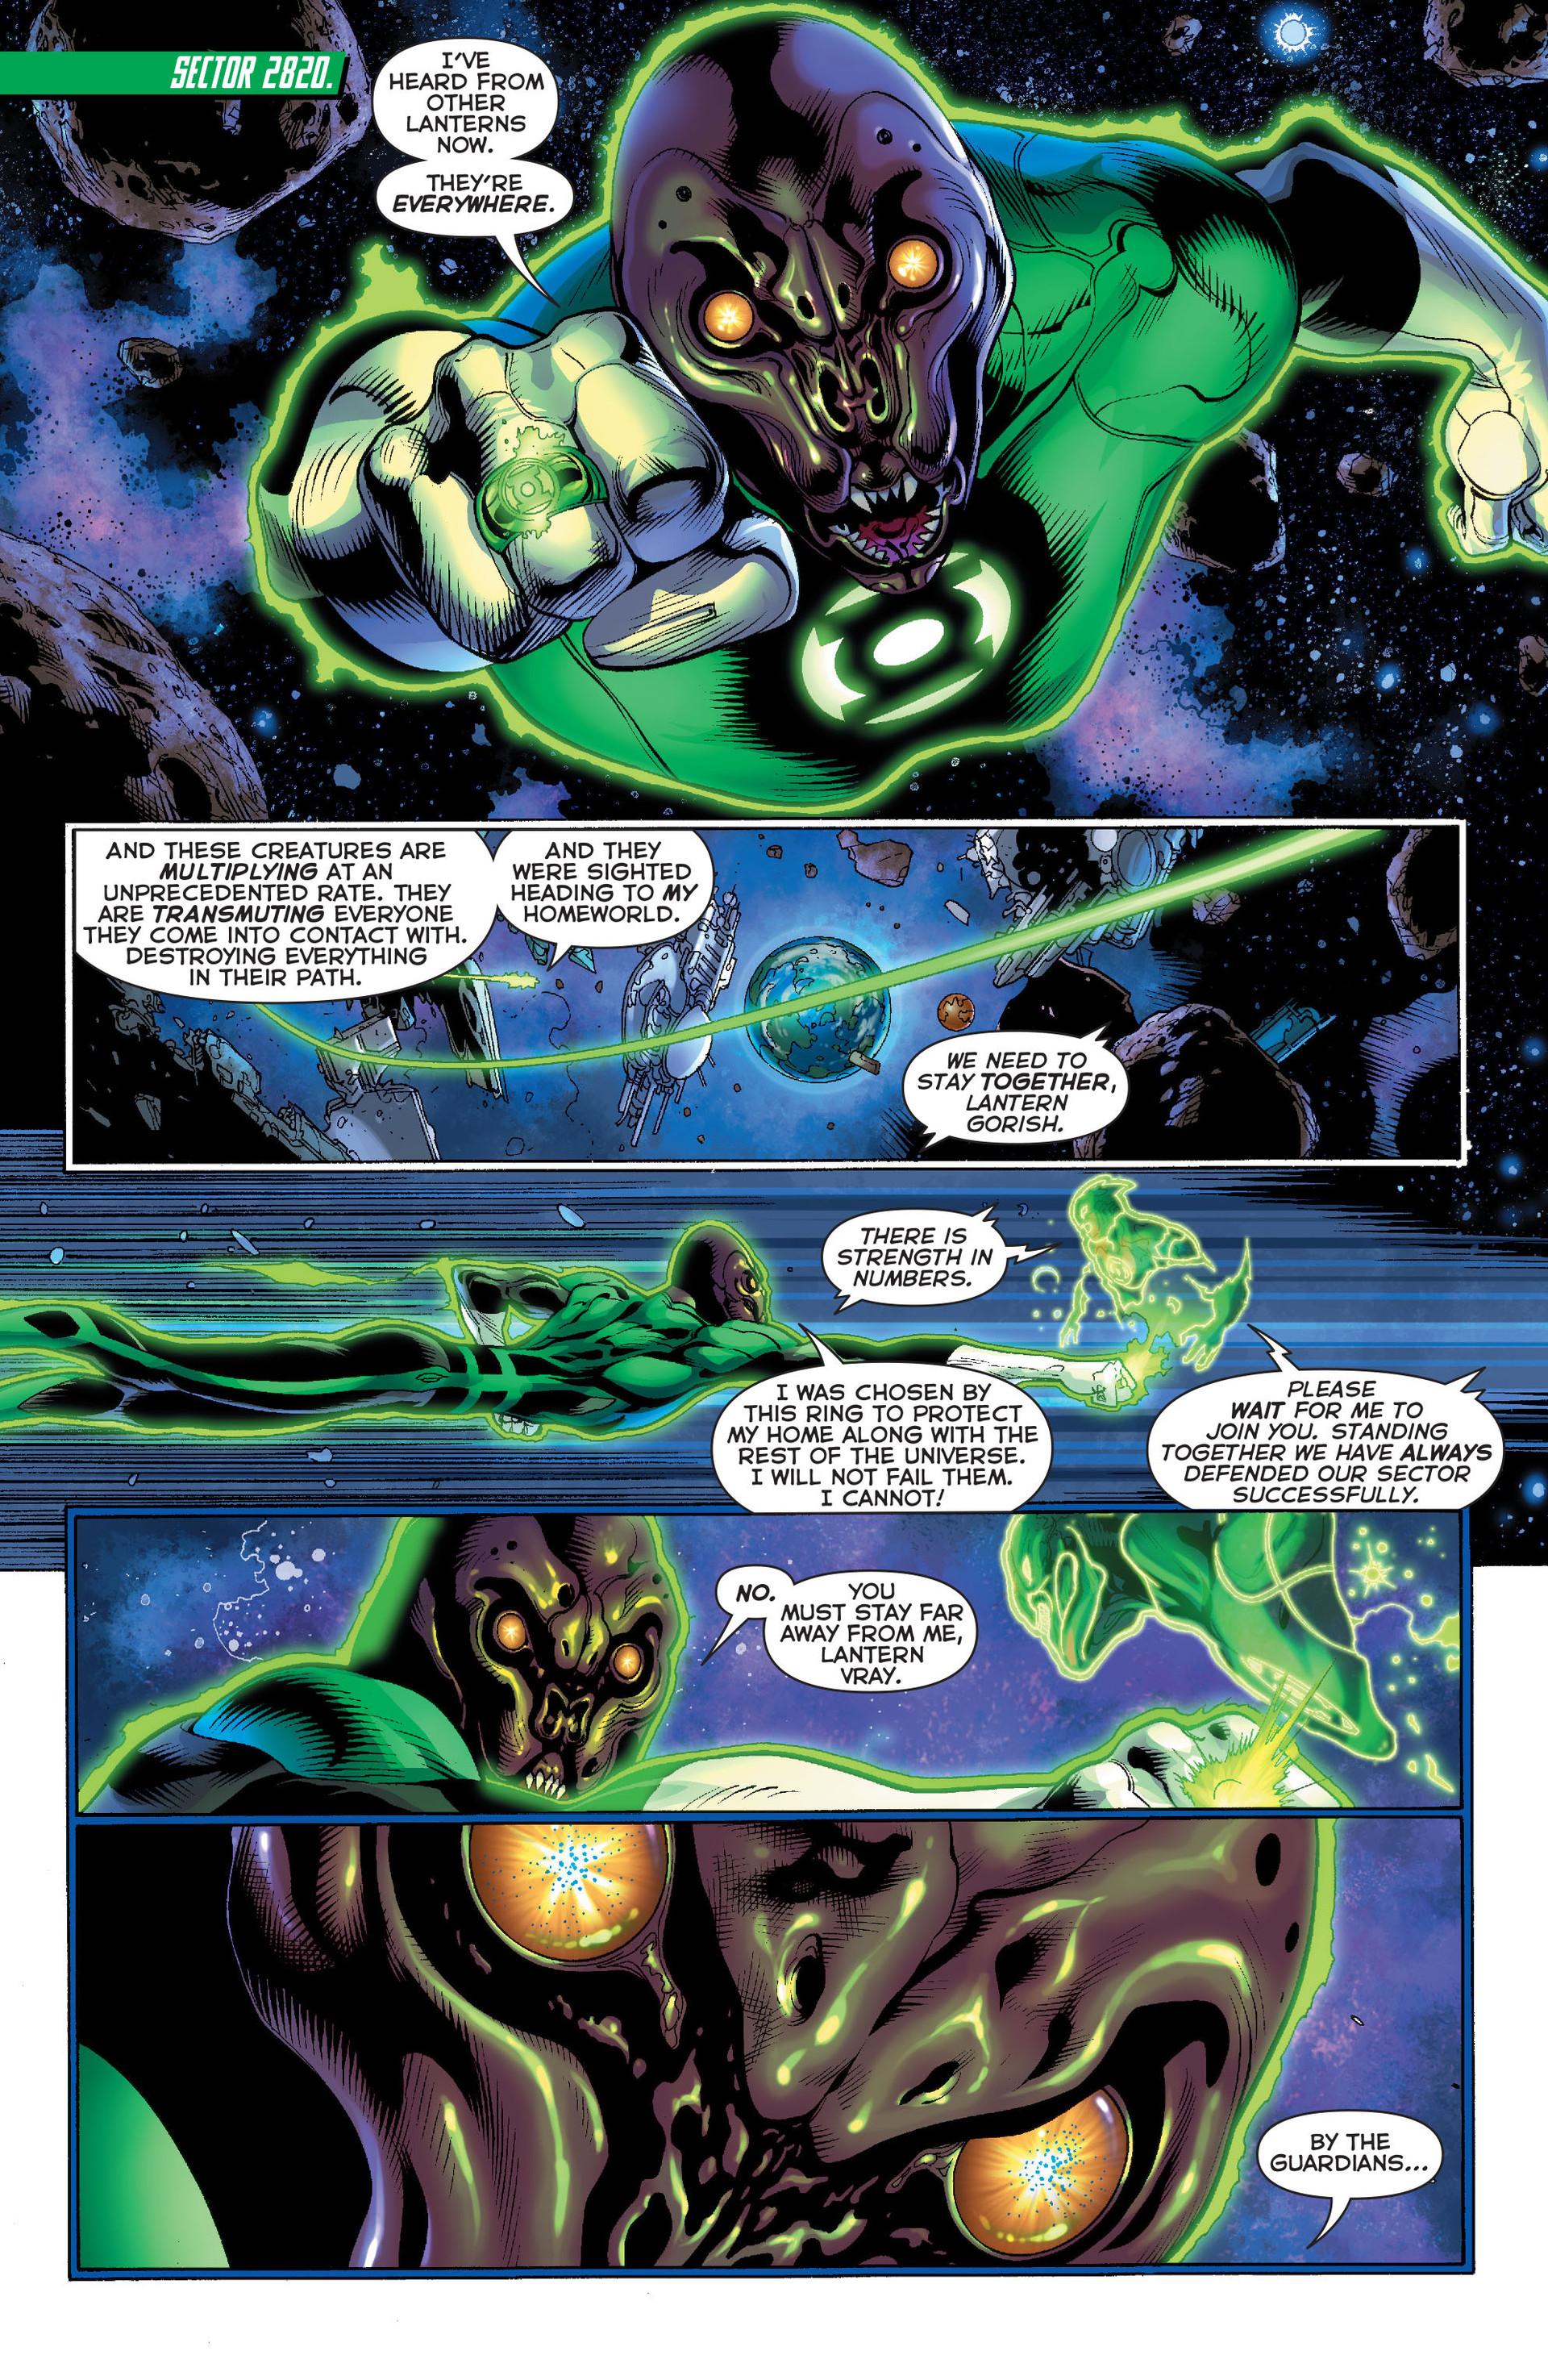 The Third Army (Green Lantern Vol 5 #15)